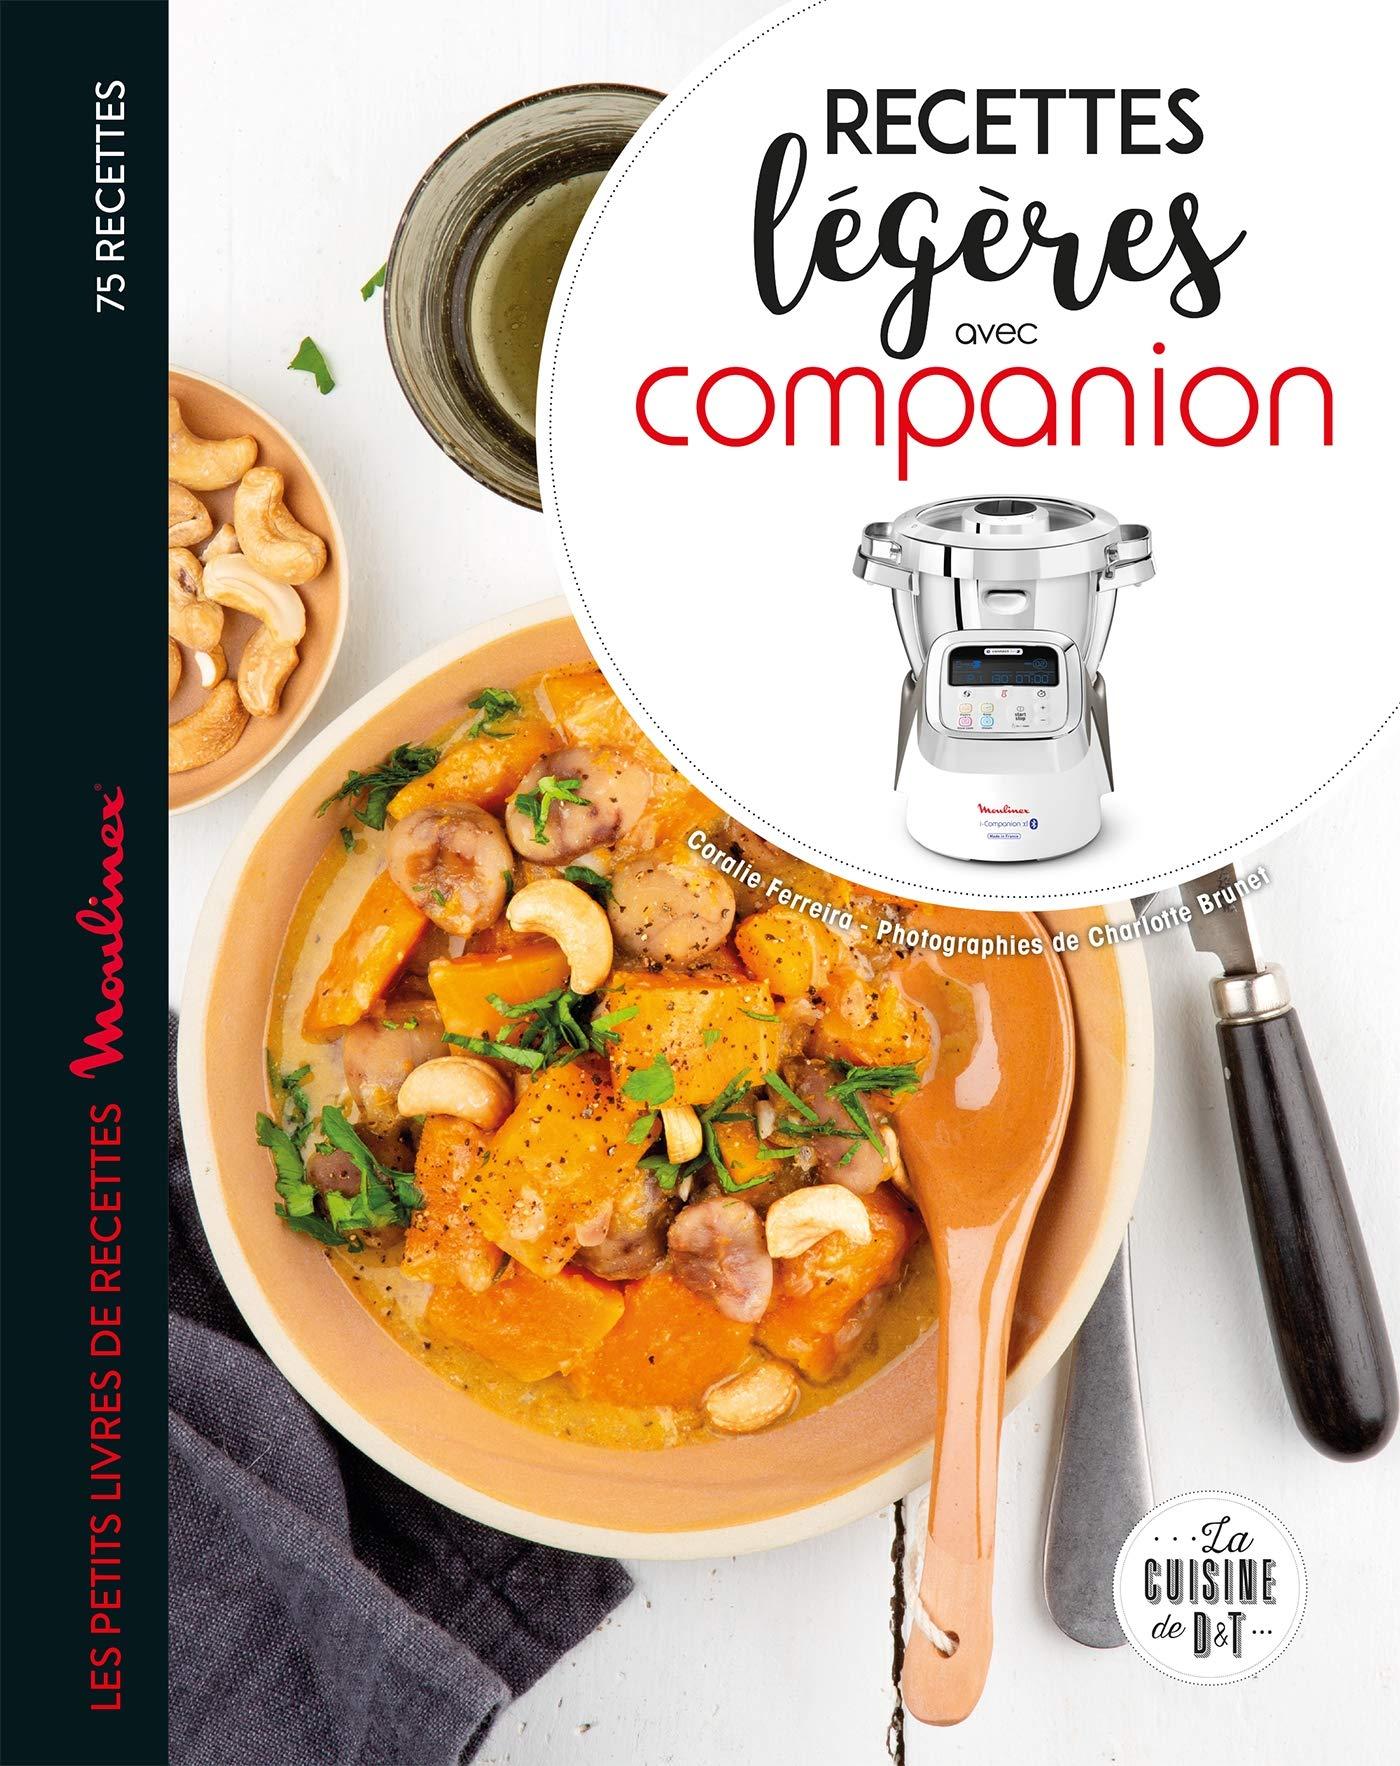 Companion recettes légères (Moulinex D&T): Amazon.es: Ferreira, Coralie: Libros en idiomas extranjeros